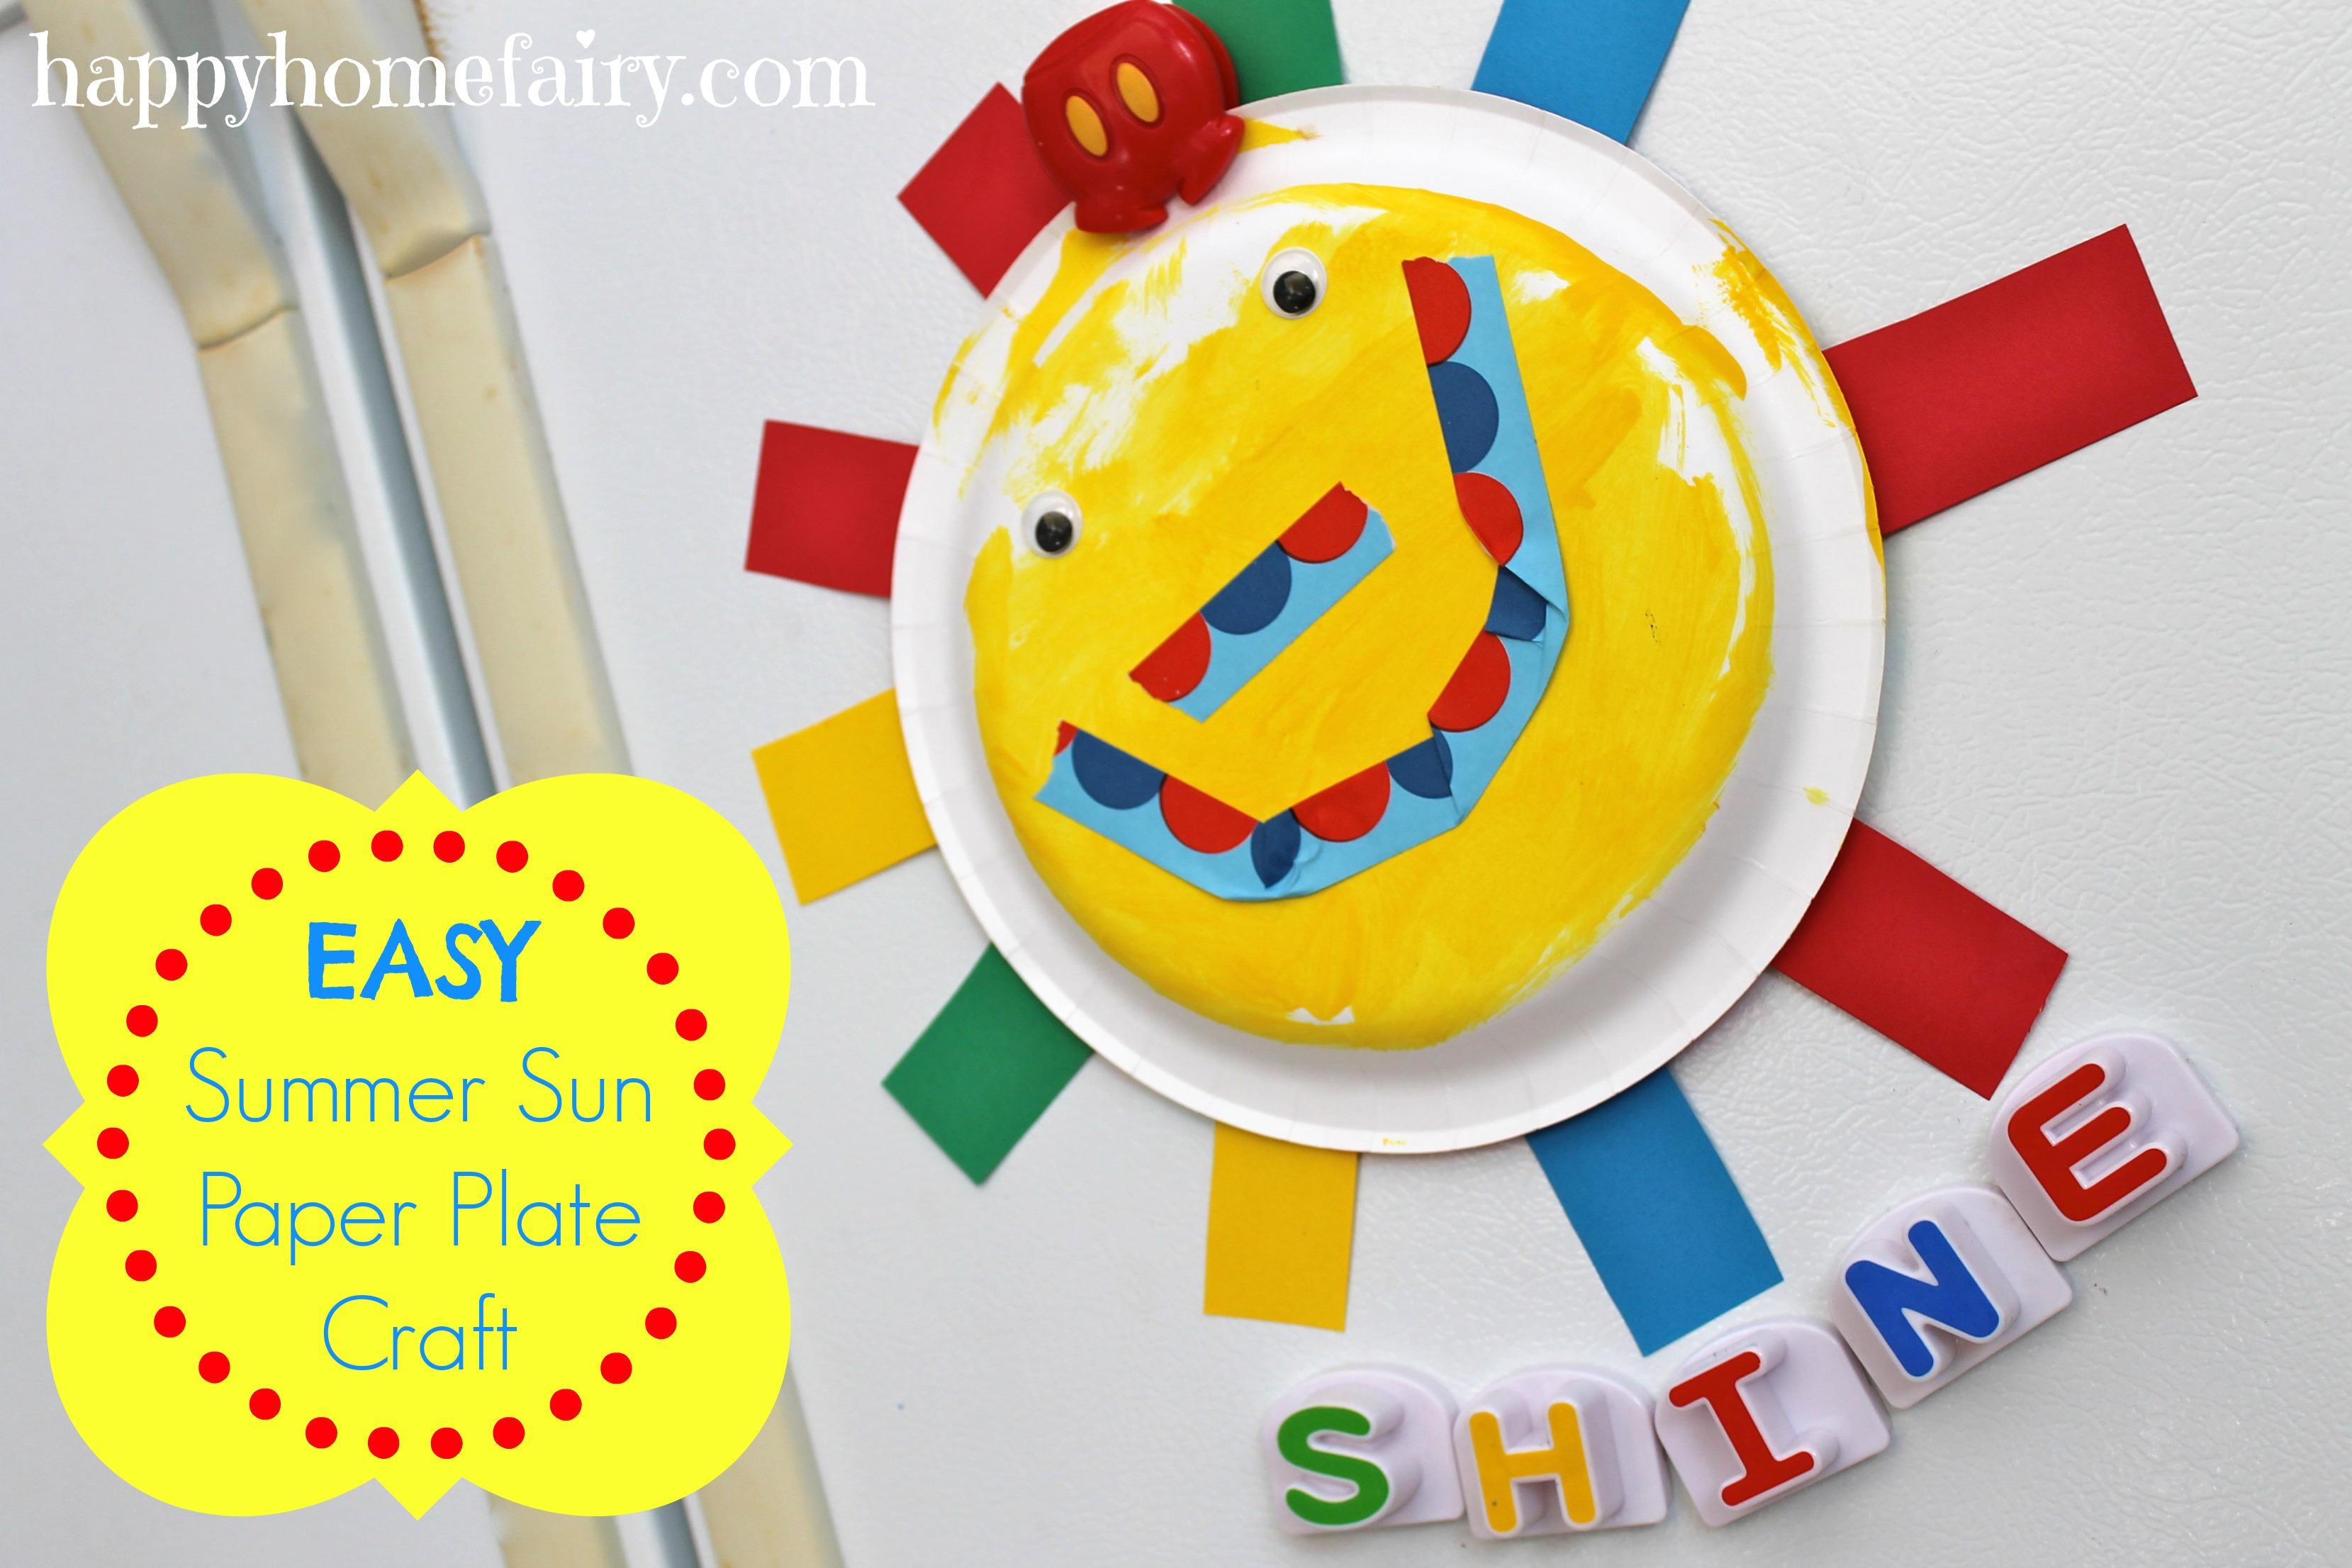 easy summer sun paper plate craft! sooo cute!  sc 1 st  Happy Home Fairy & Easy Summer Sun Paper Plate Craft - Happy Home Fairy